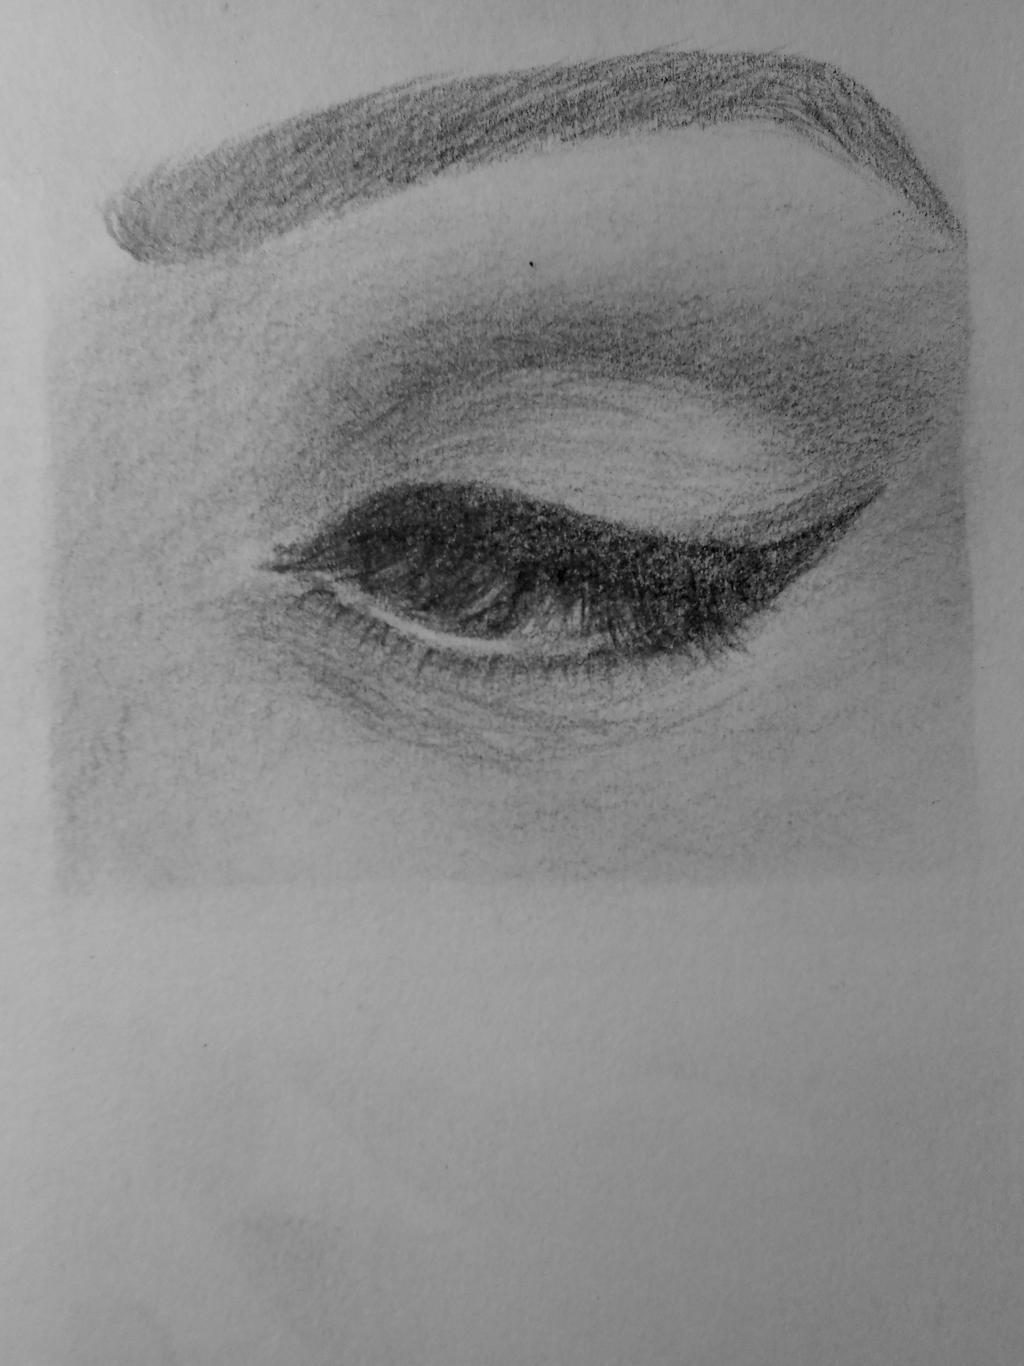 Eye Drawing by Zaiccu on DeviantArt